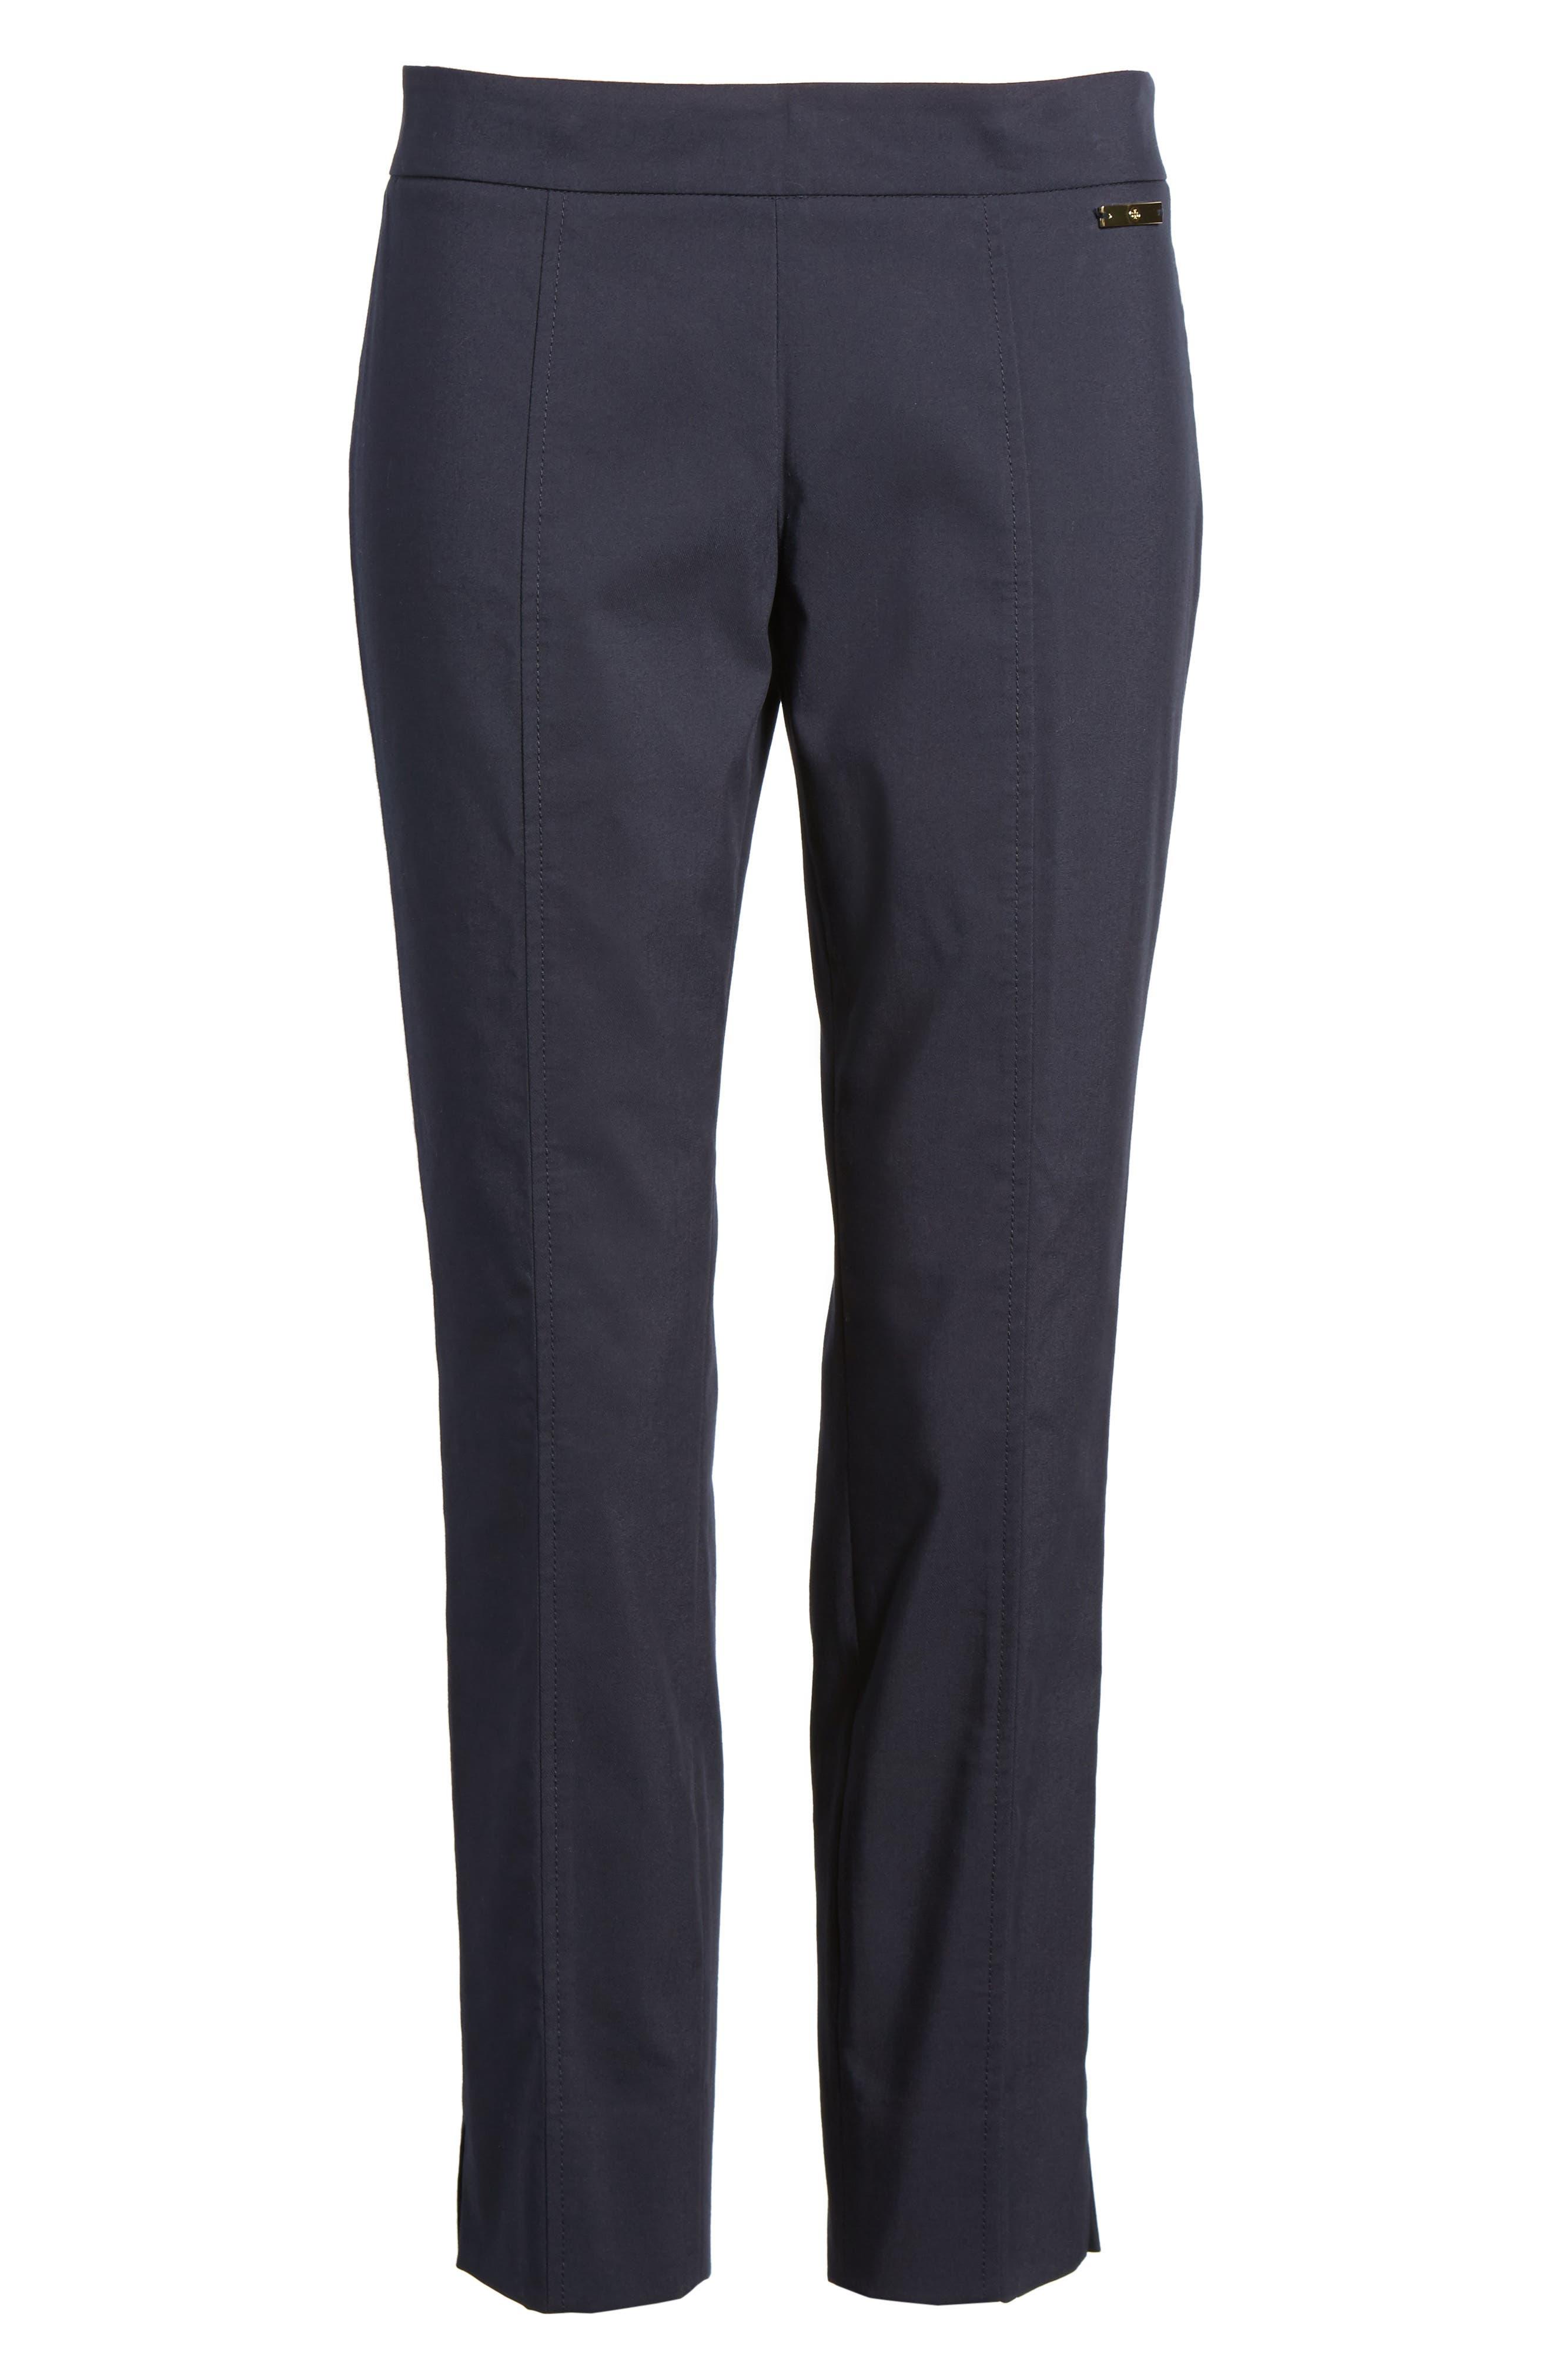 'Callie' Seamed Crop Pants,                         Main,                         color, 411